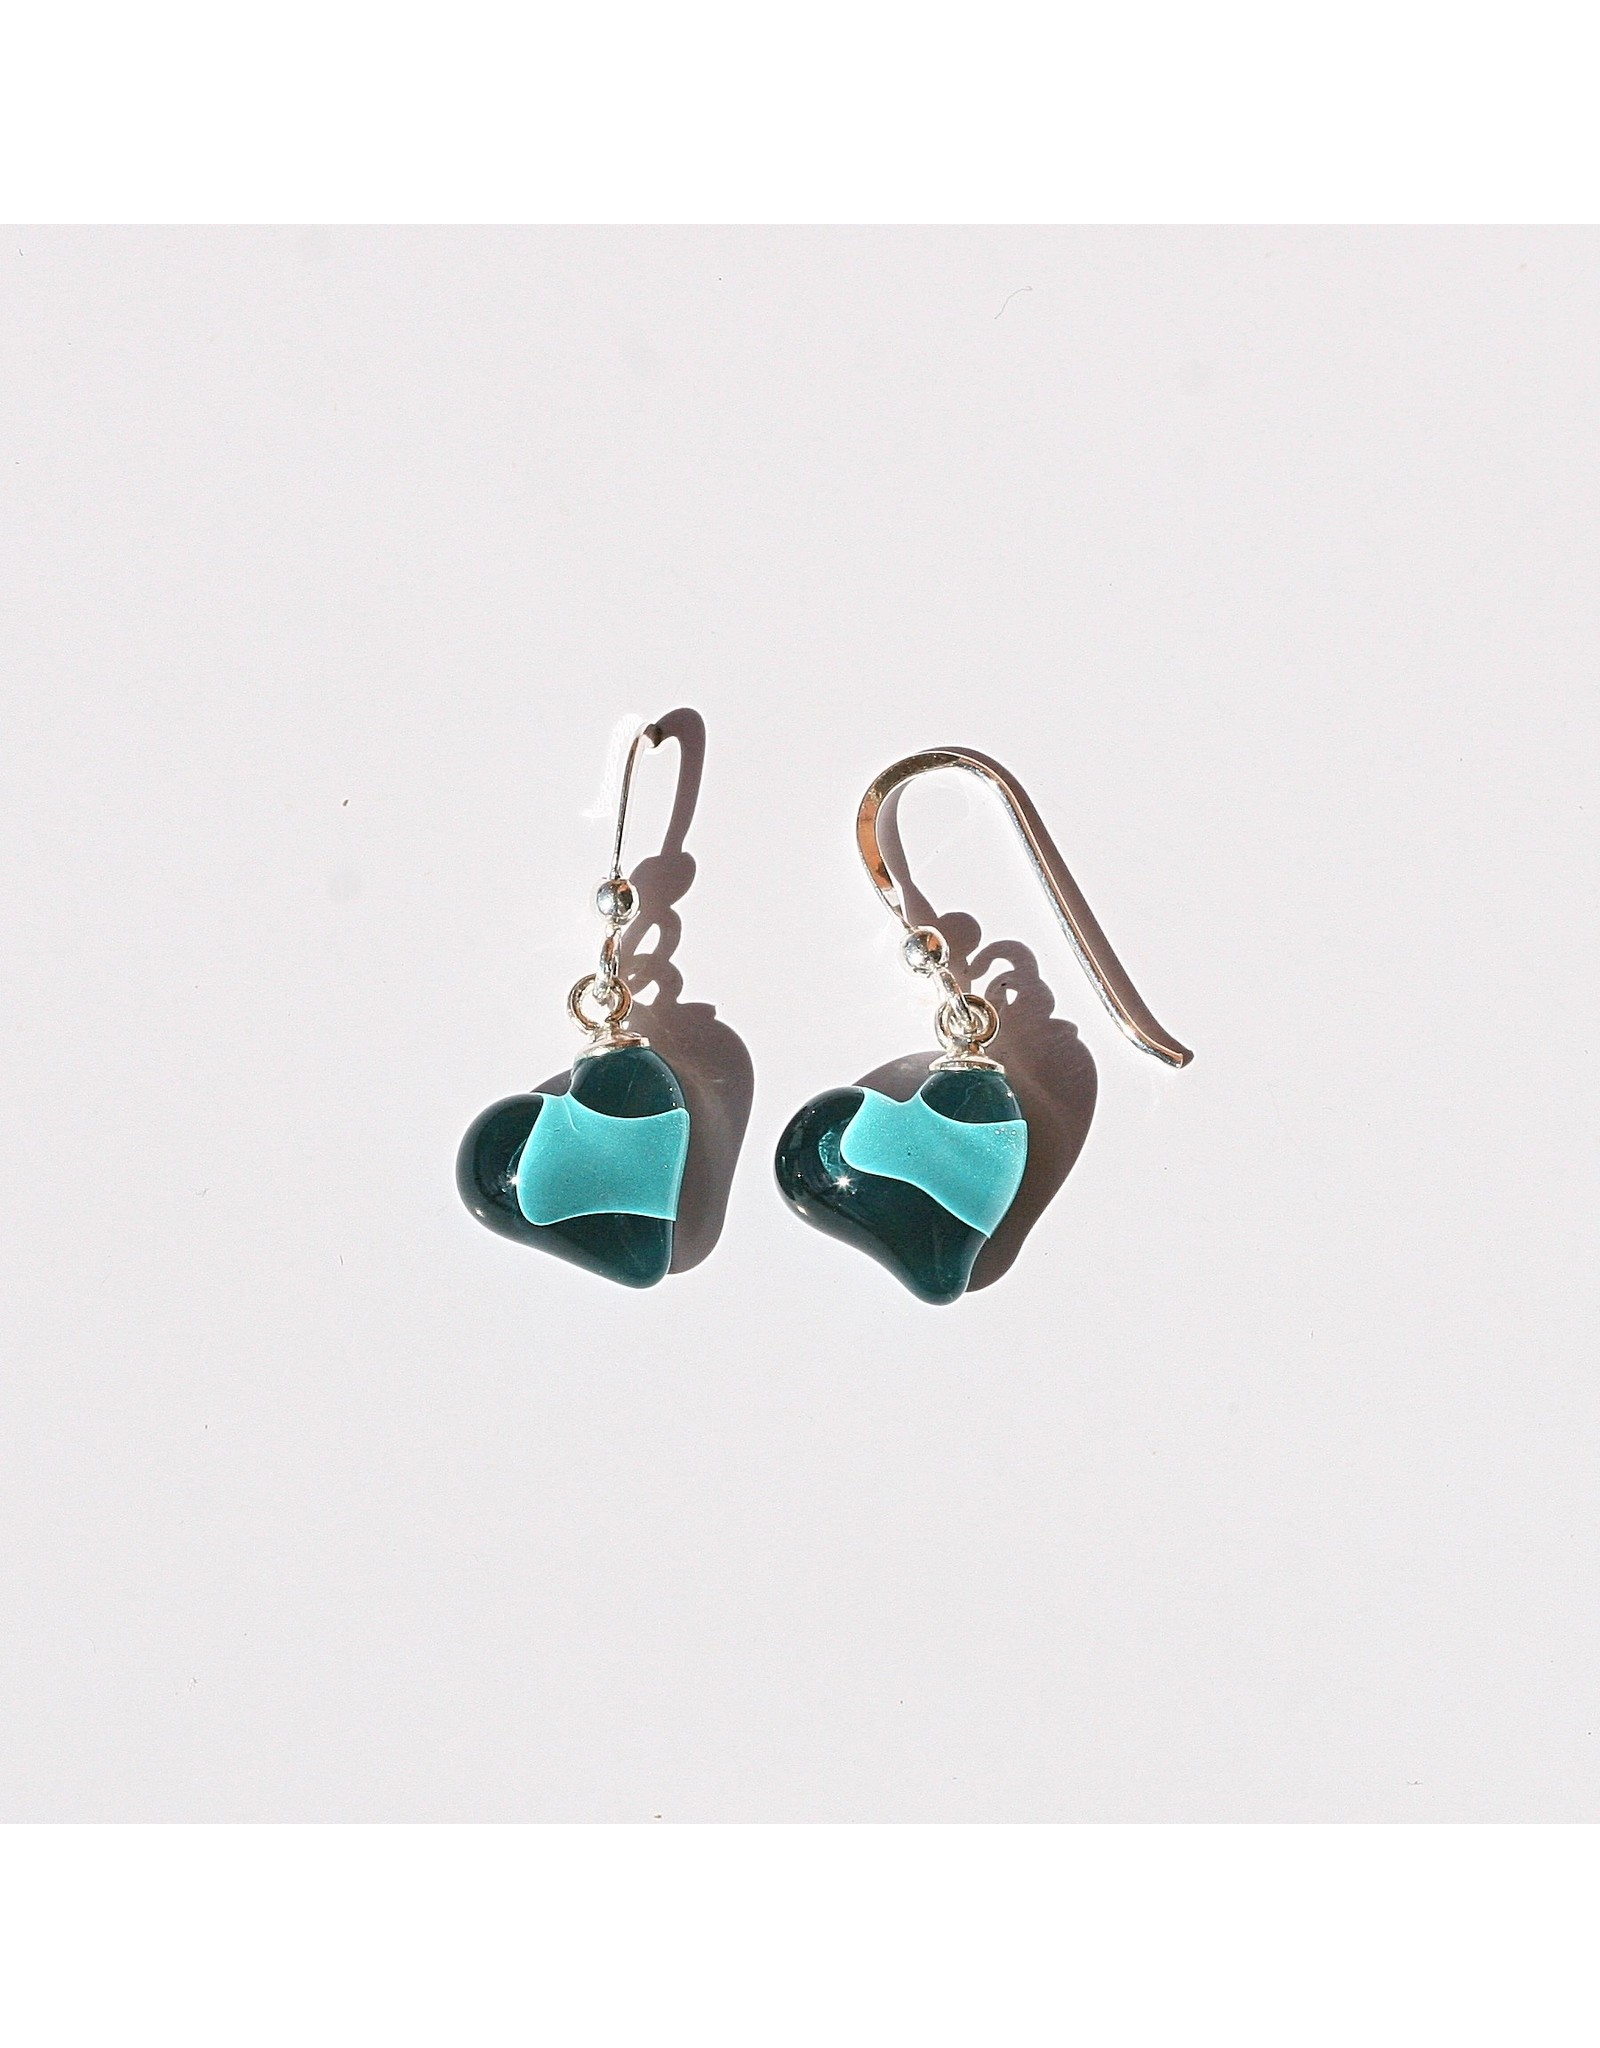 Perfecto Glass EARRING (Petite Heart, PERF)